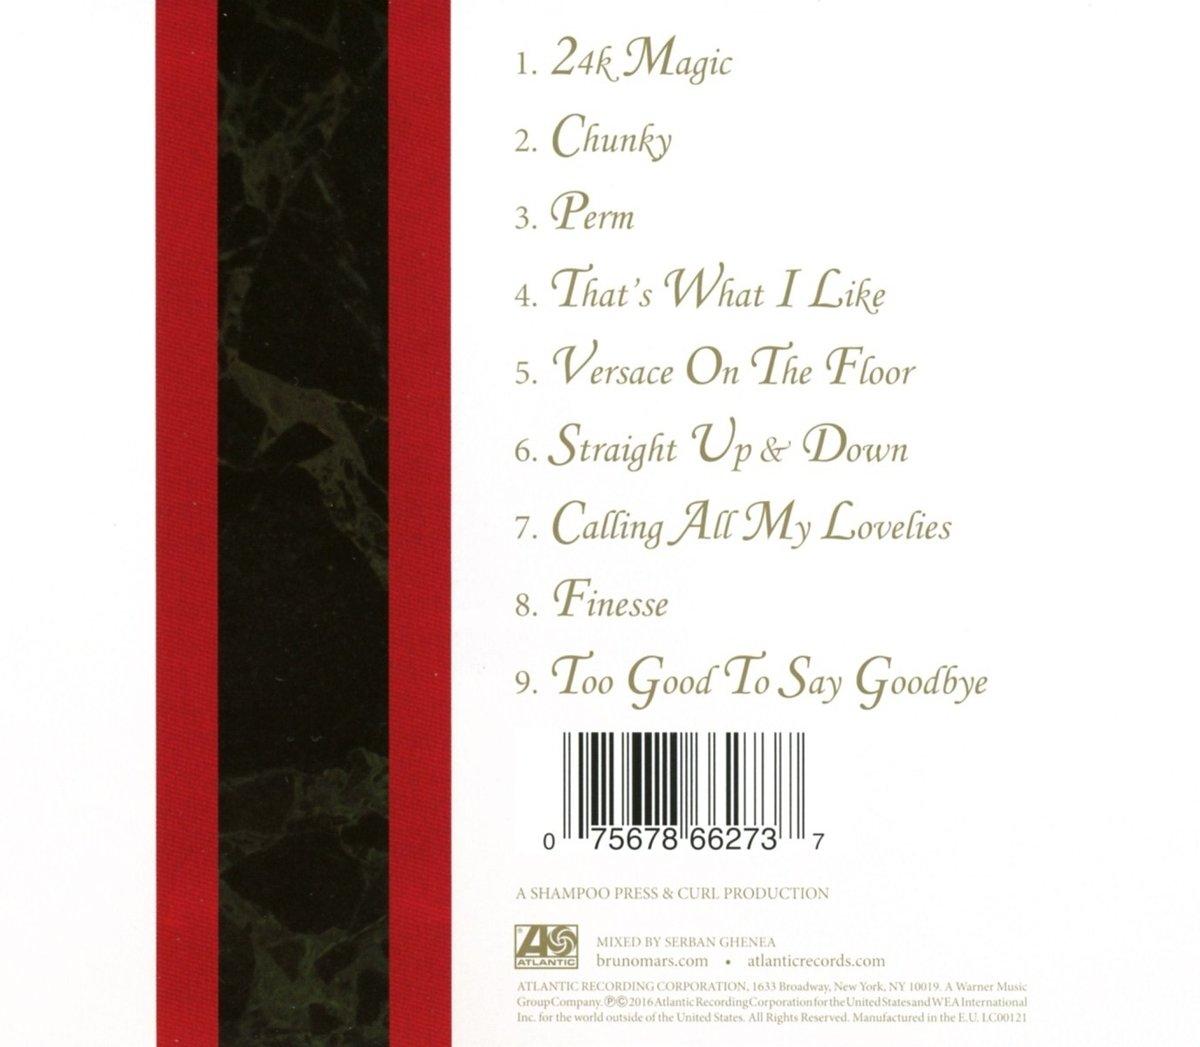 24K Magic by CD (Image #1)